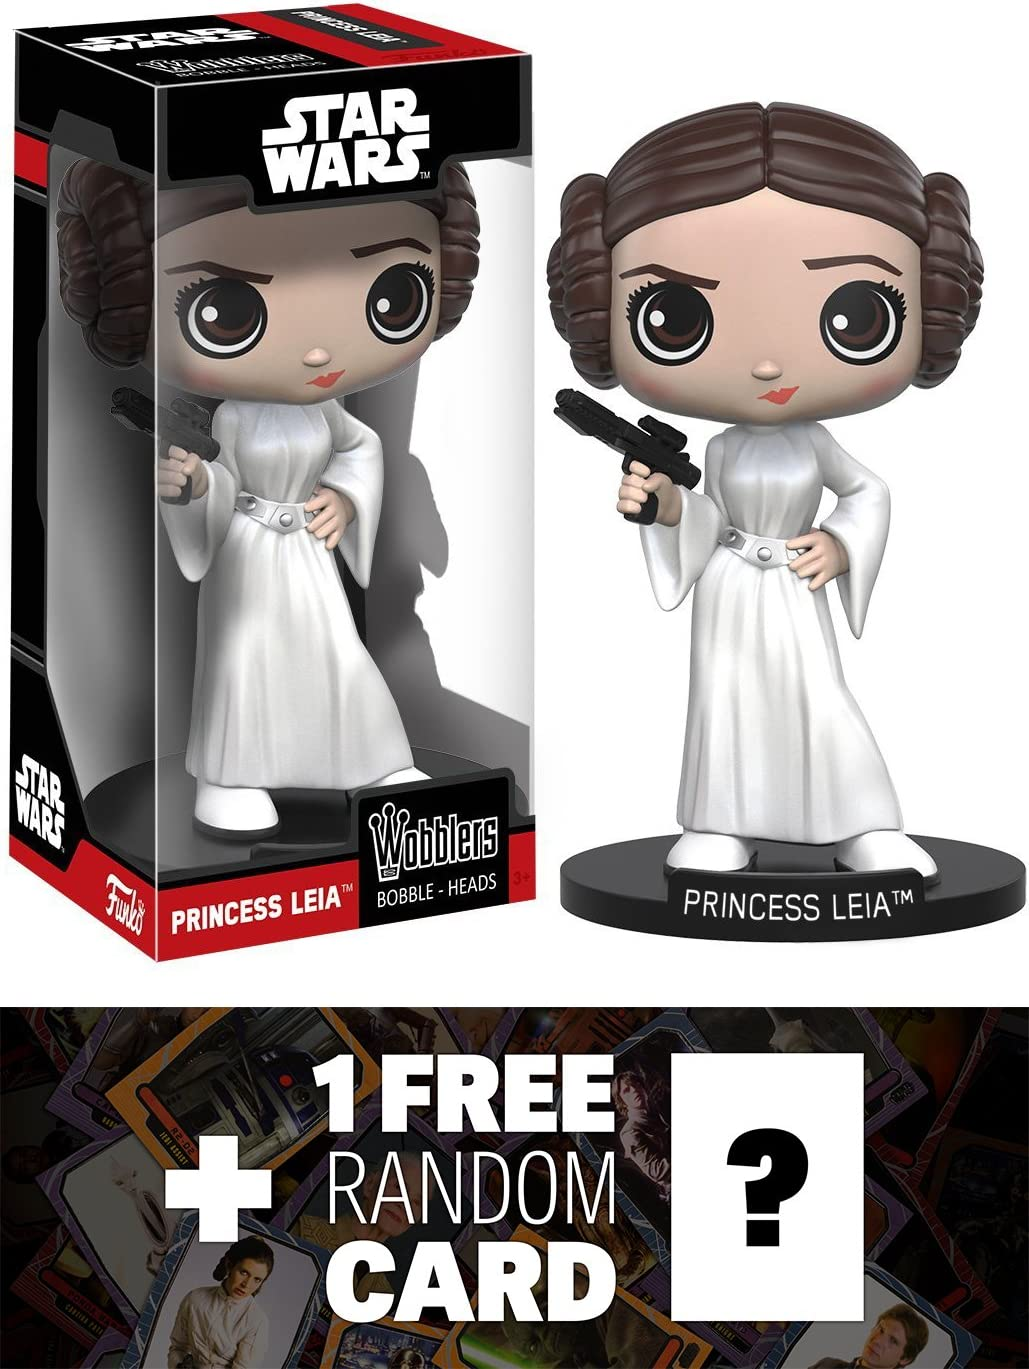 BCC9481027 107181 Princess Leia: Funko Wobblers x Star Wars Vinyl Figure 1 FREE Official Star Wars Trading Card Bundle